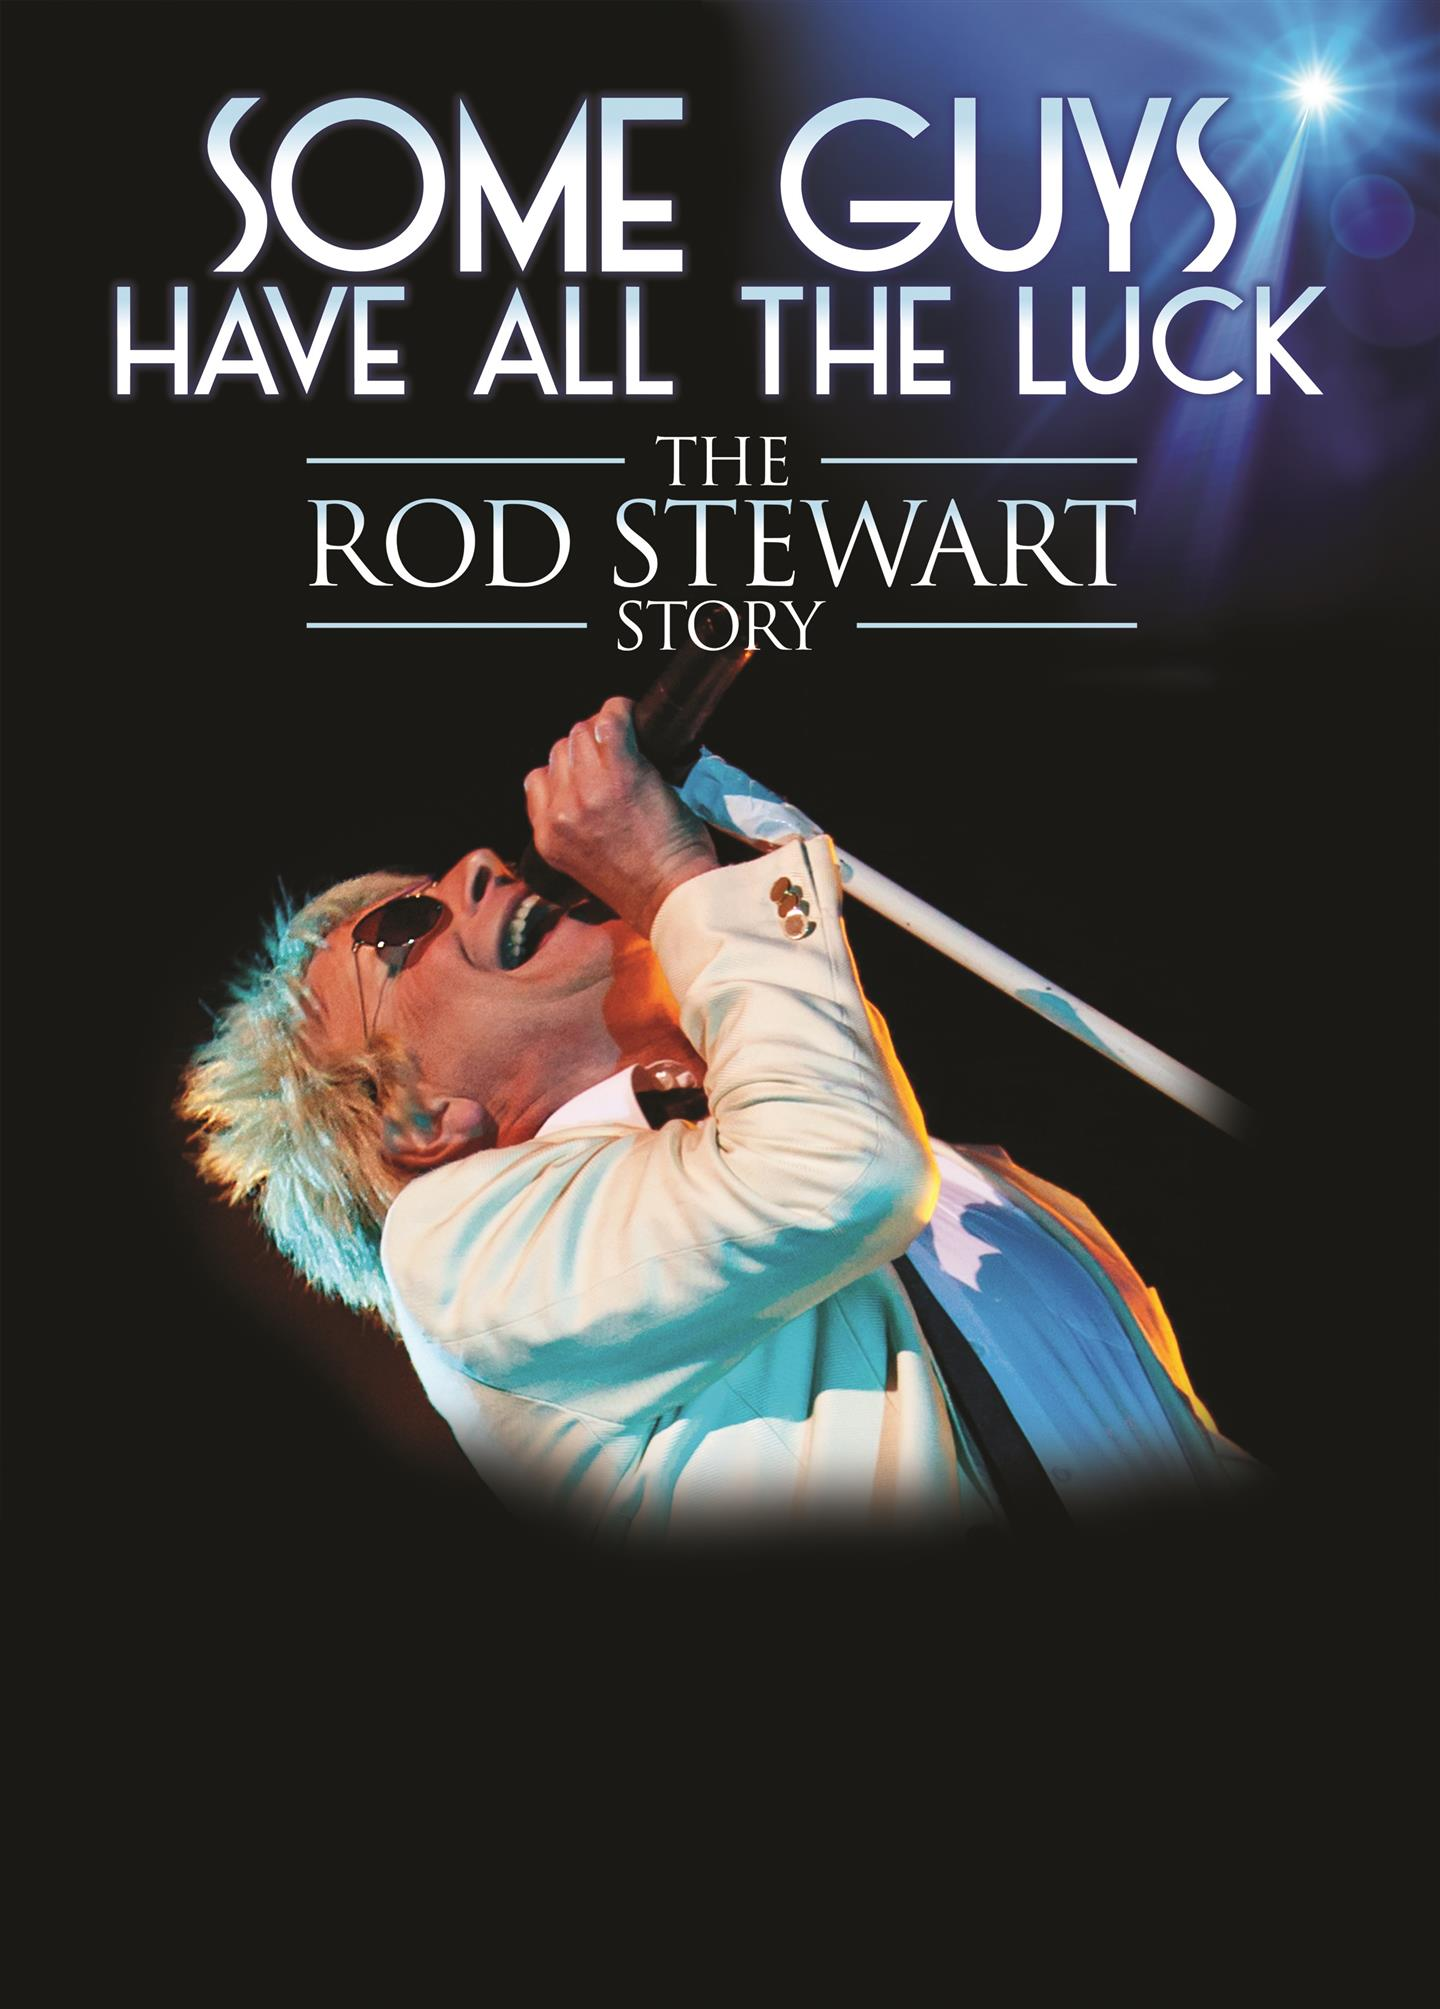 The Rod Stewart Story